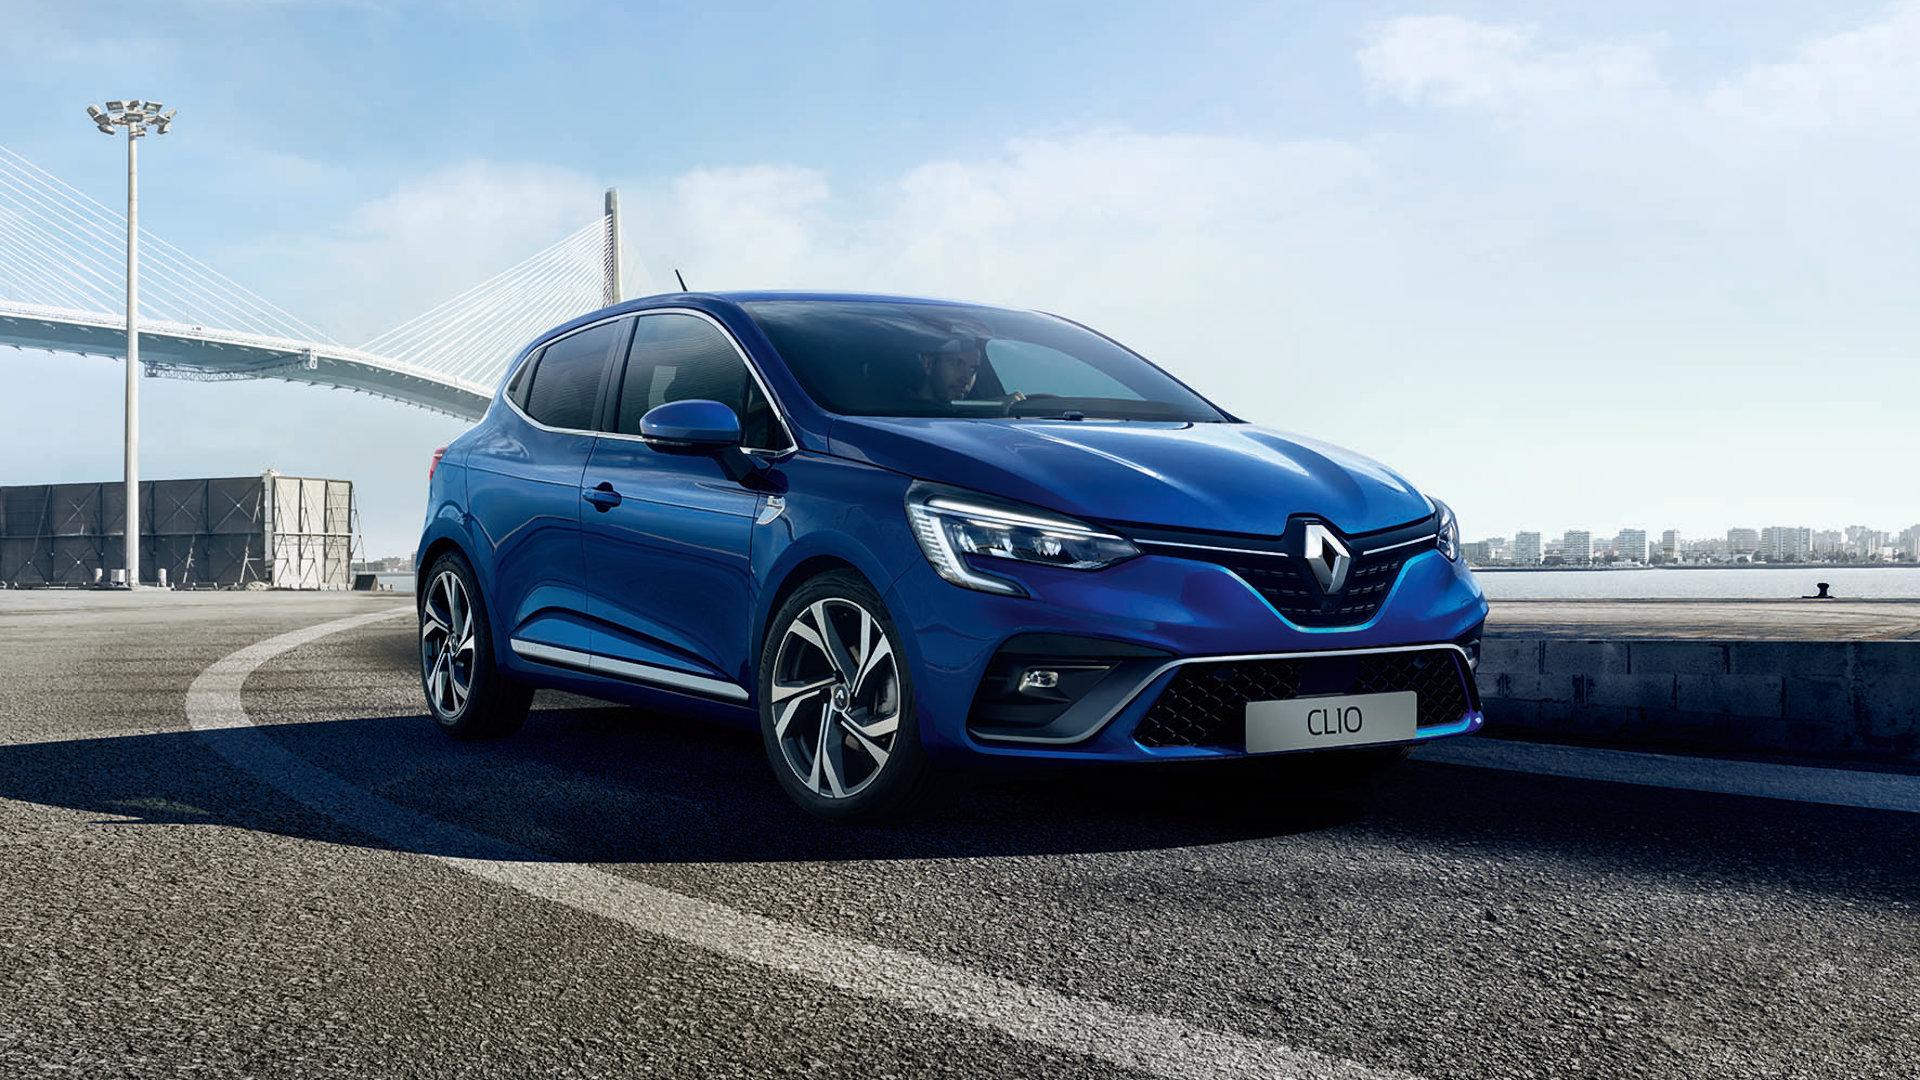 2019 - [Renault] Clio V (BJA) - Page 38 190129081749730664